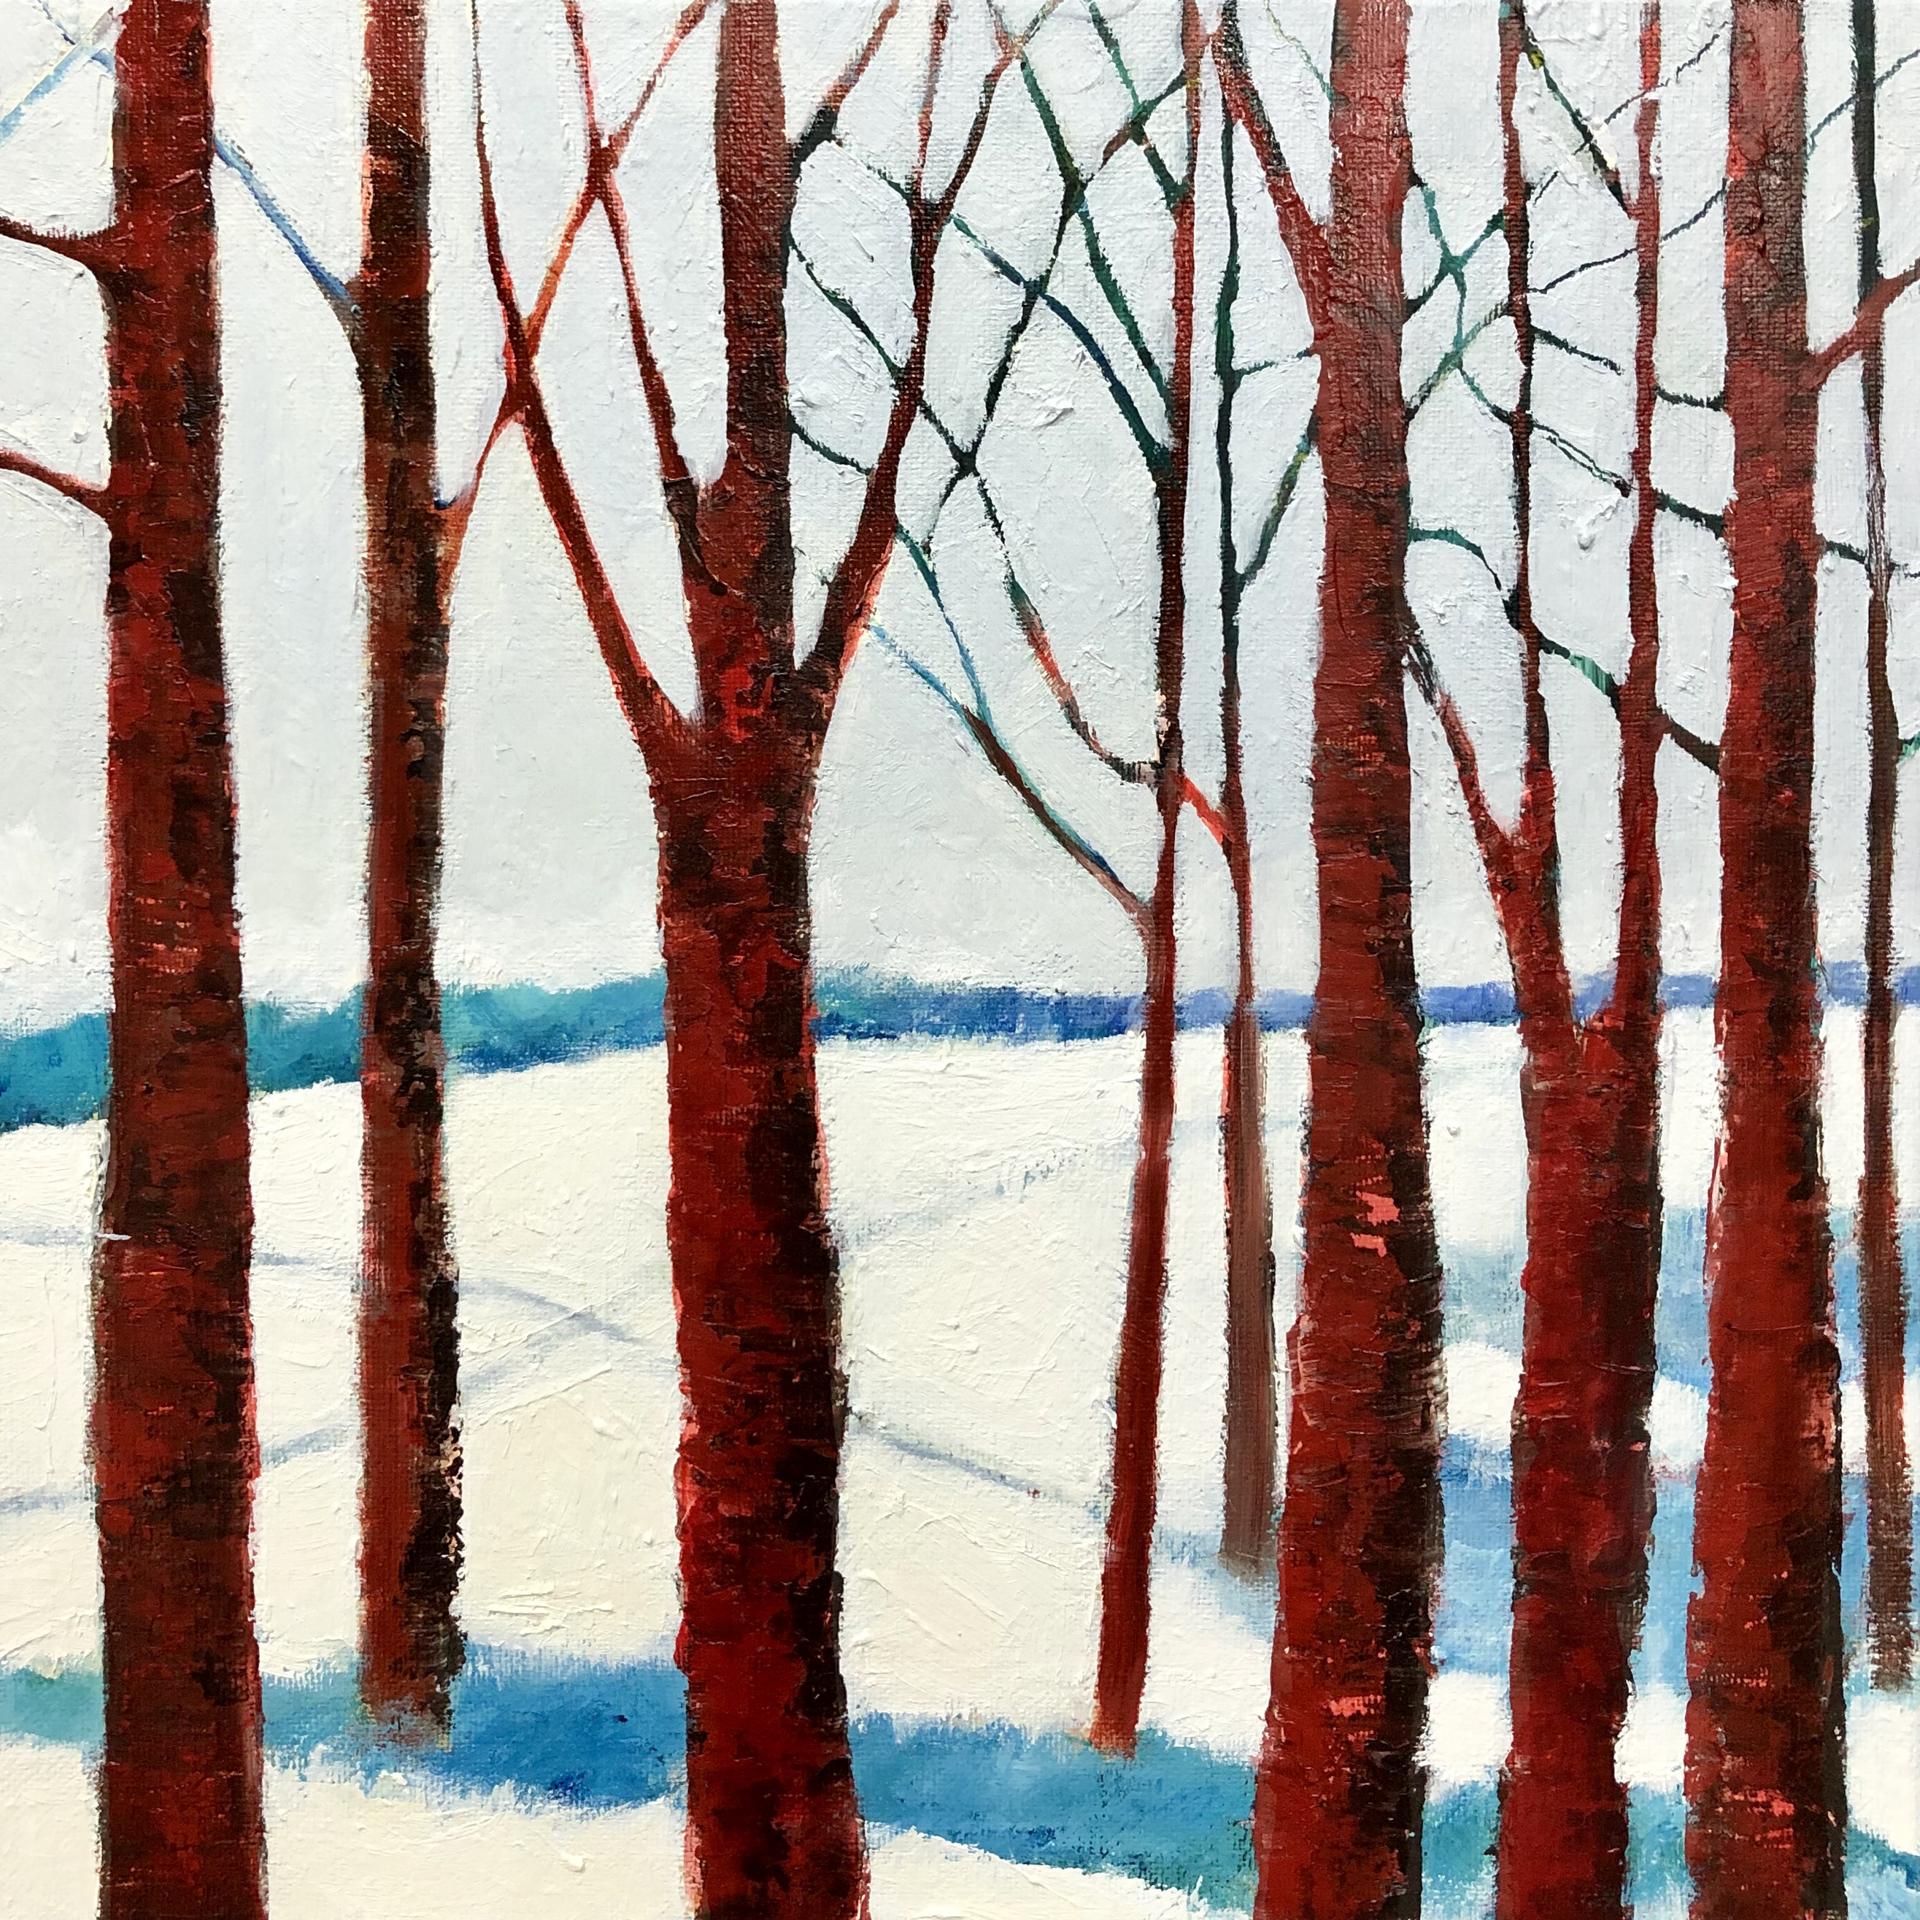 Cross Country 2 by Kimberly Wheaton